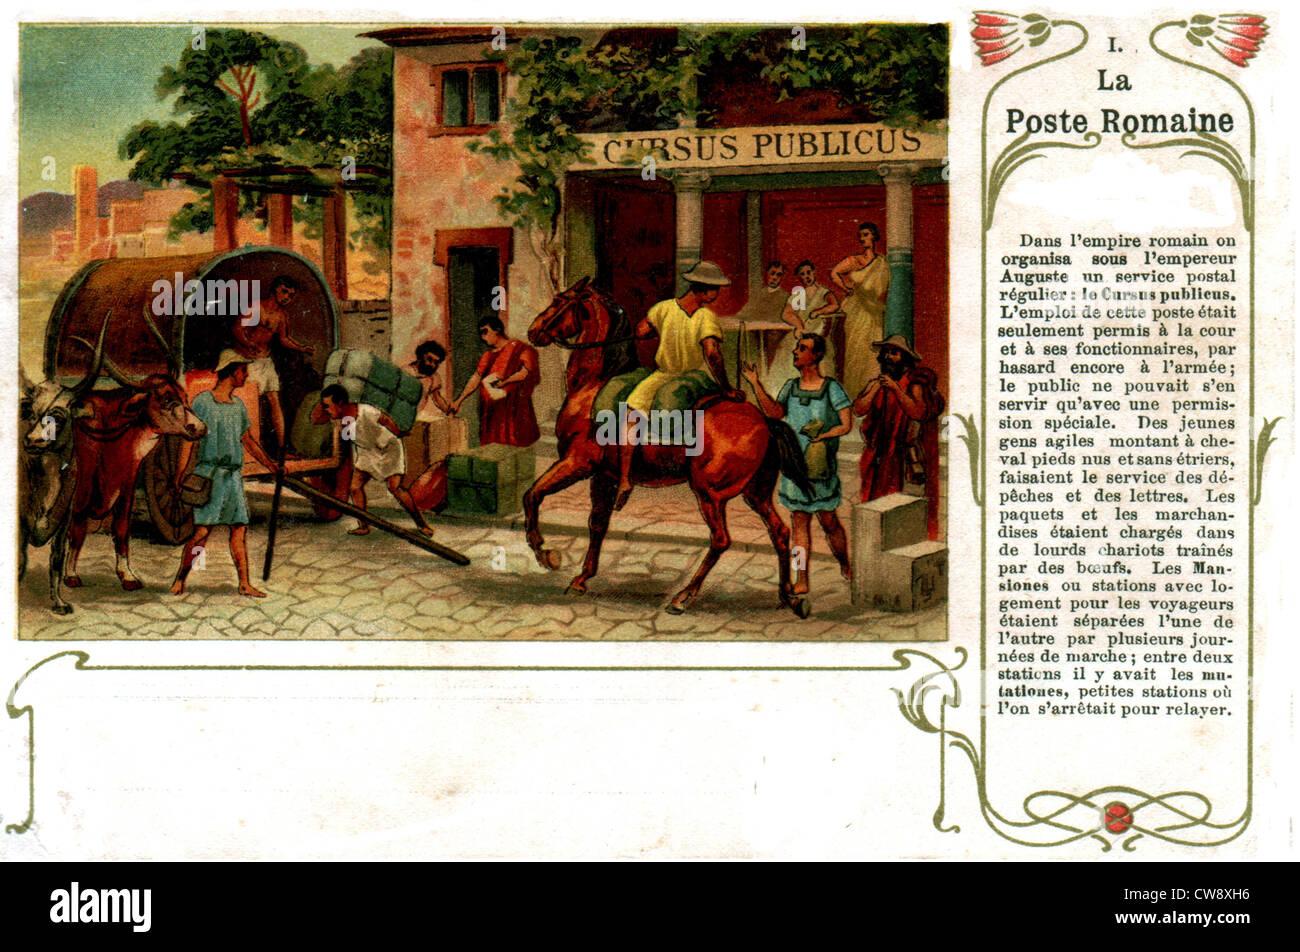 Organization postal service under Emperor Augustus - Stock Image